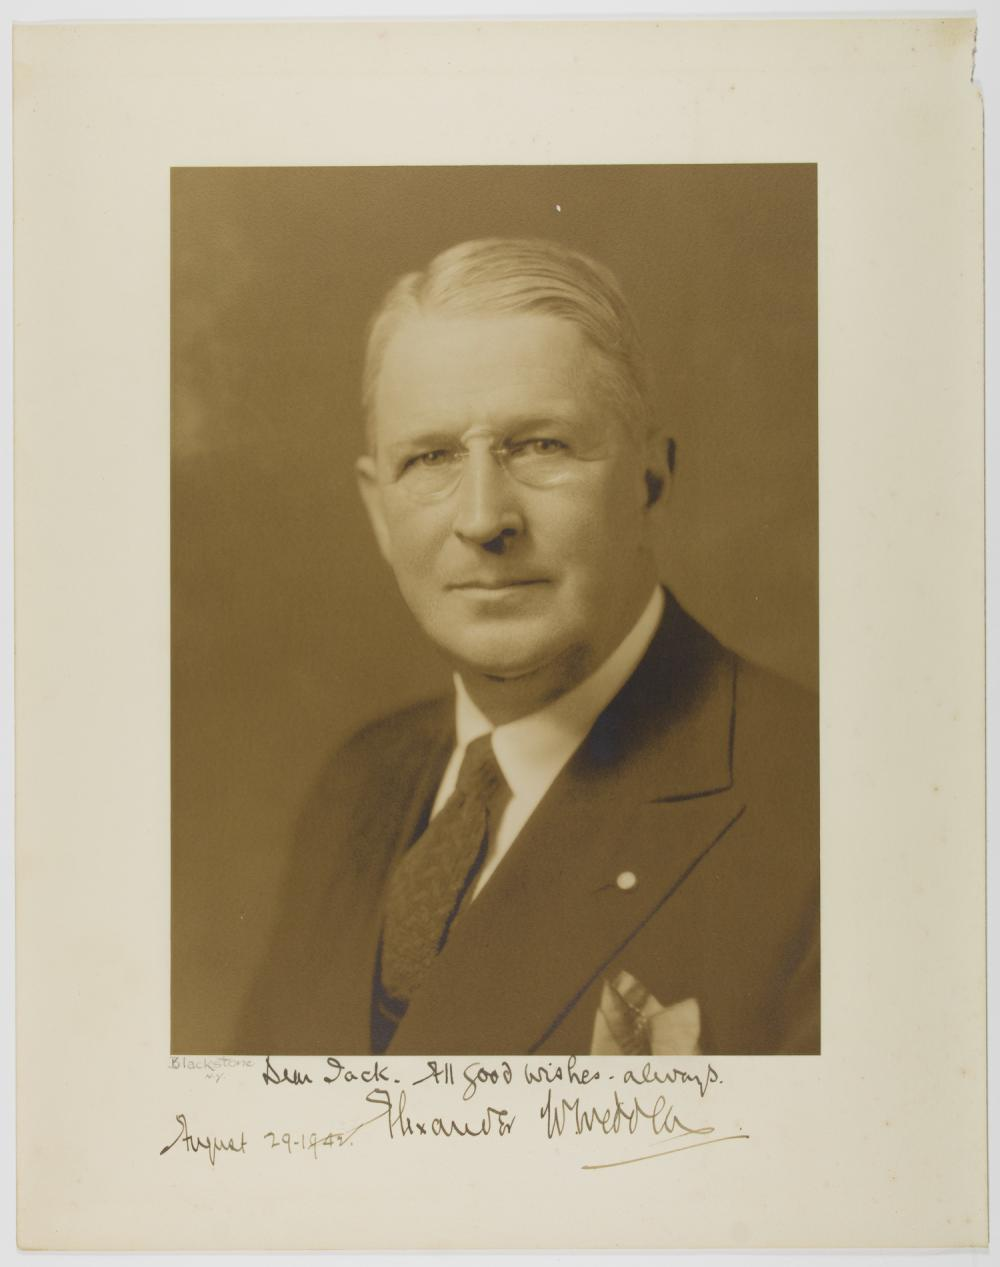 ALEXANDER W. WEDDELL